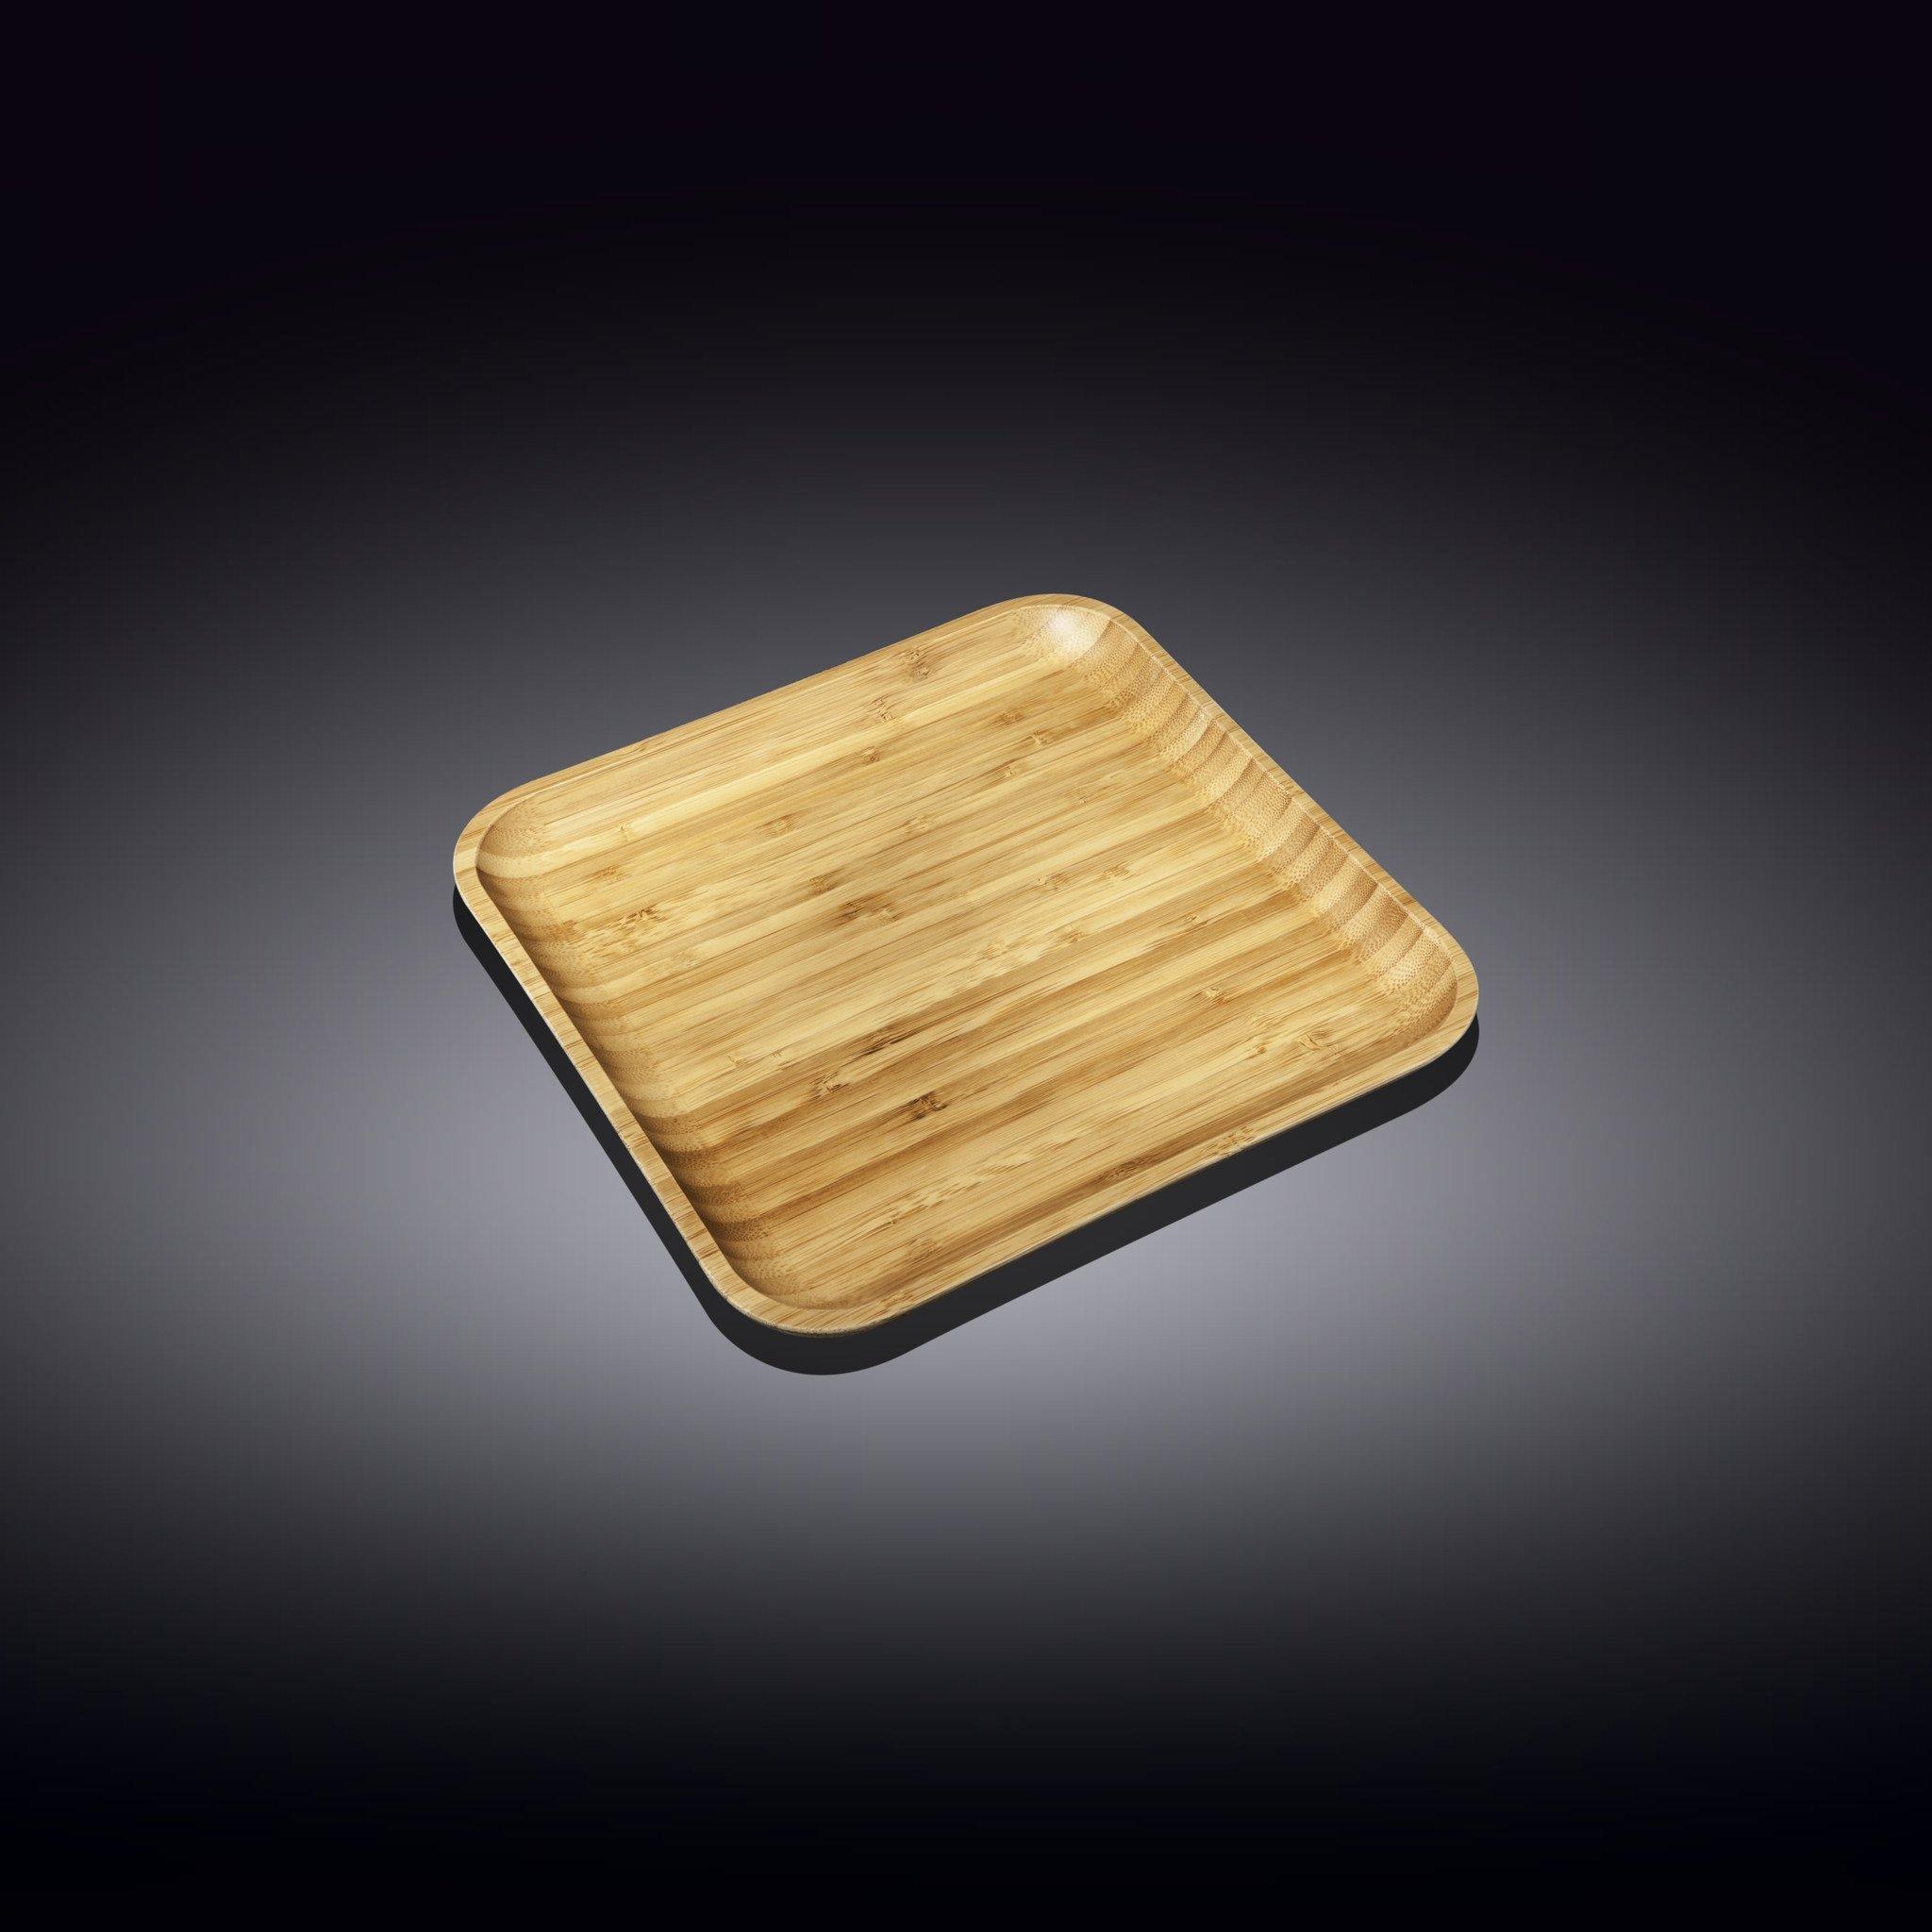 Тарелка бамбуковая Wilmax сервировочная квадратная 12,5 x 12,5 см